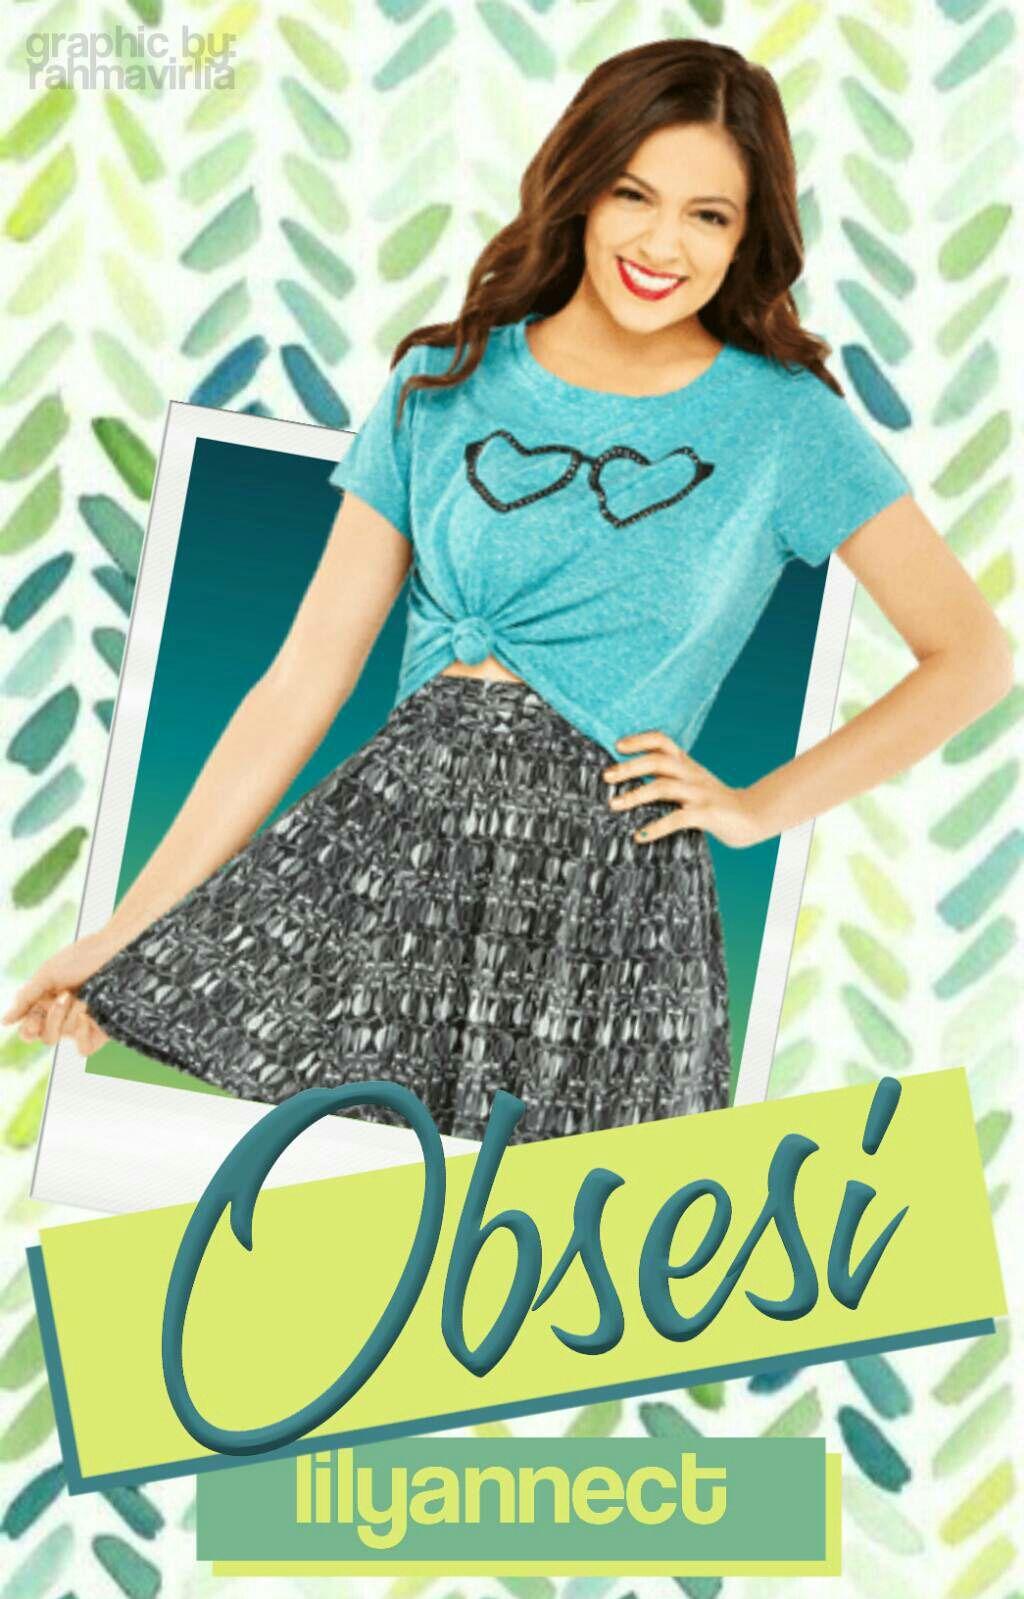 Ini Ceritanya Cover Contest Close Contoh Cover Book Design